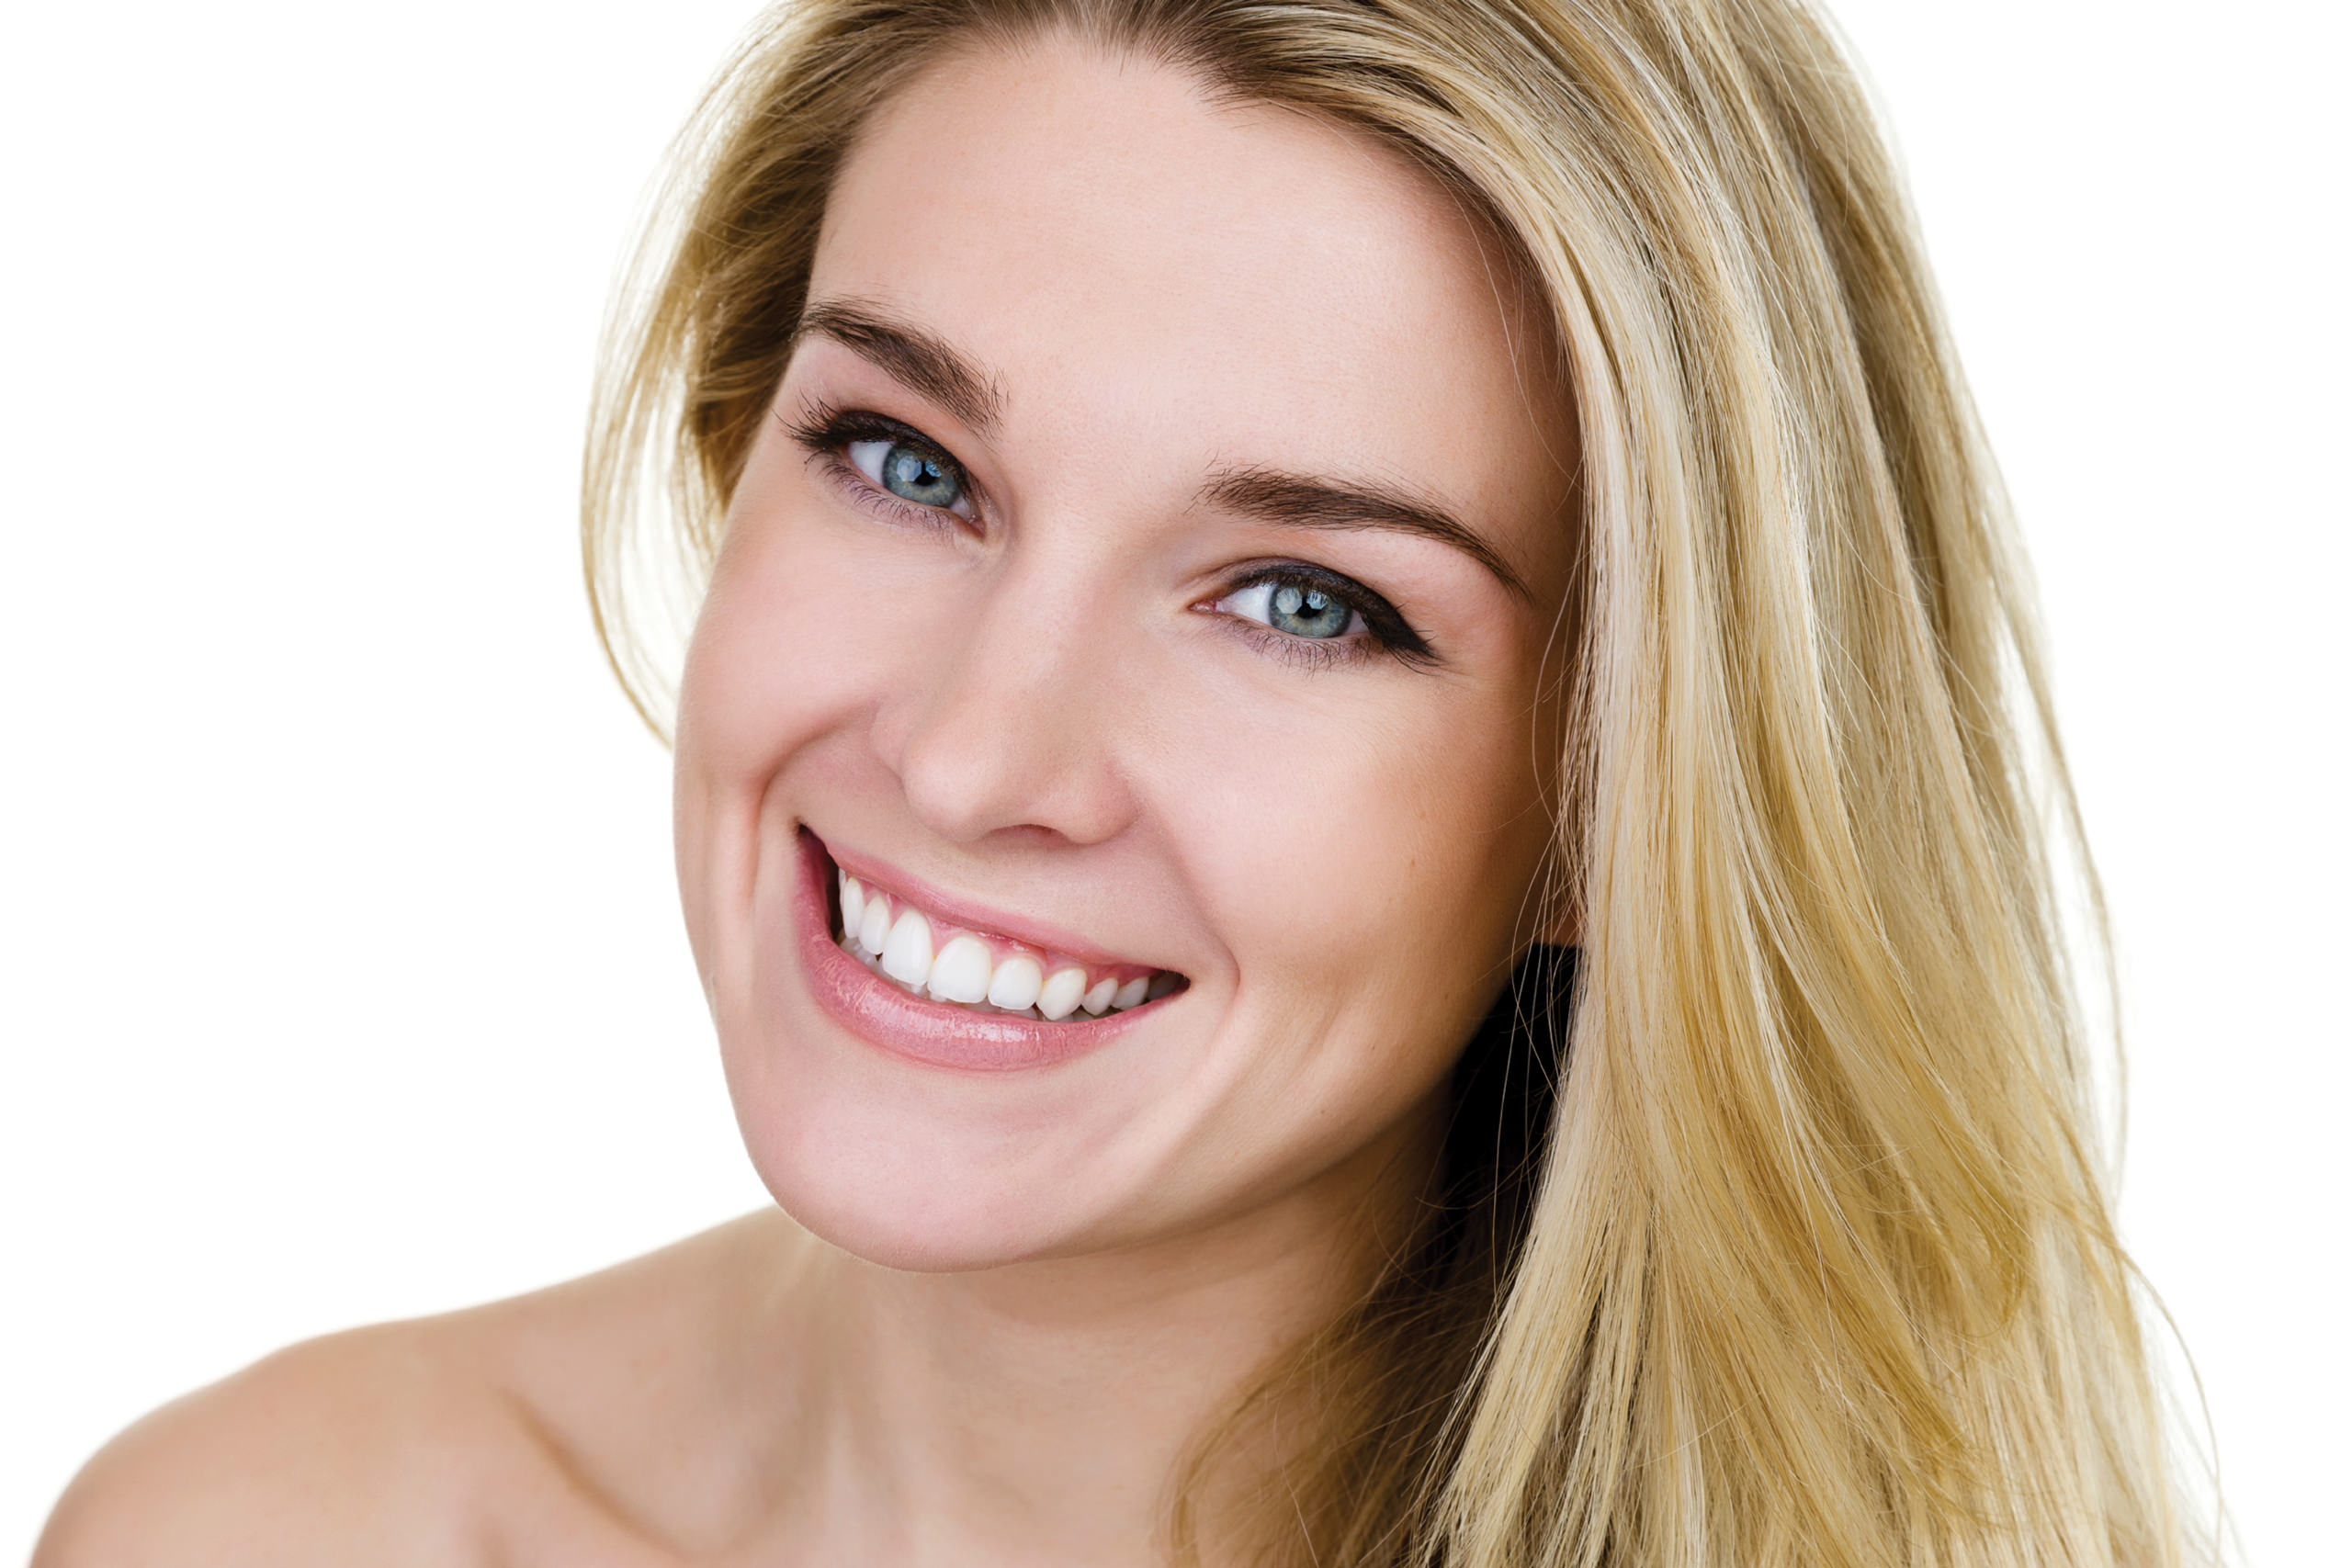 pw-smiling-model-1.jpg